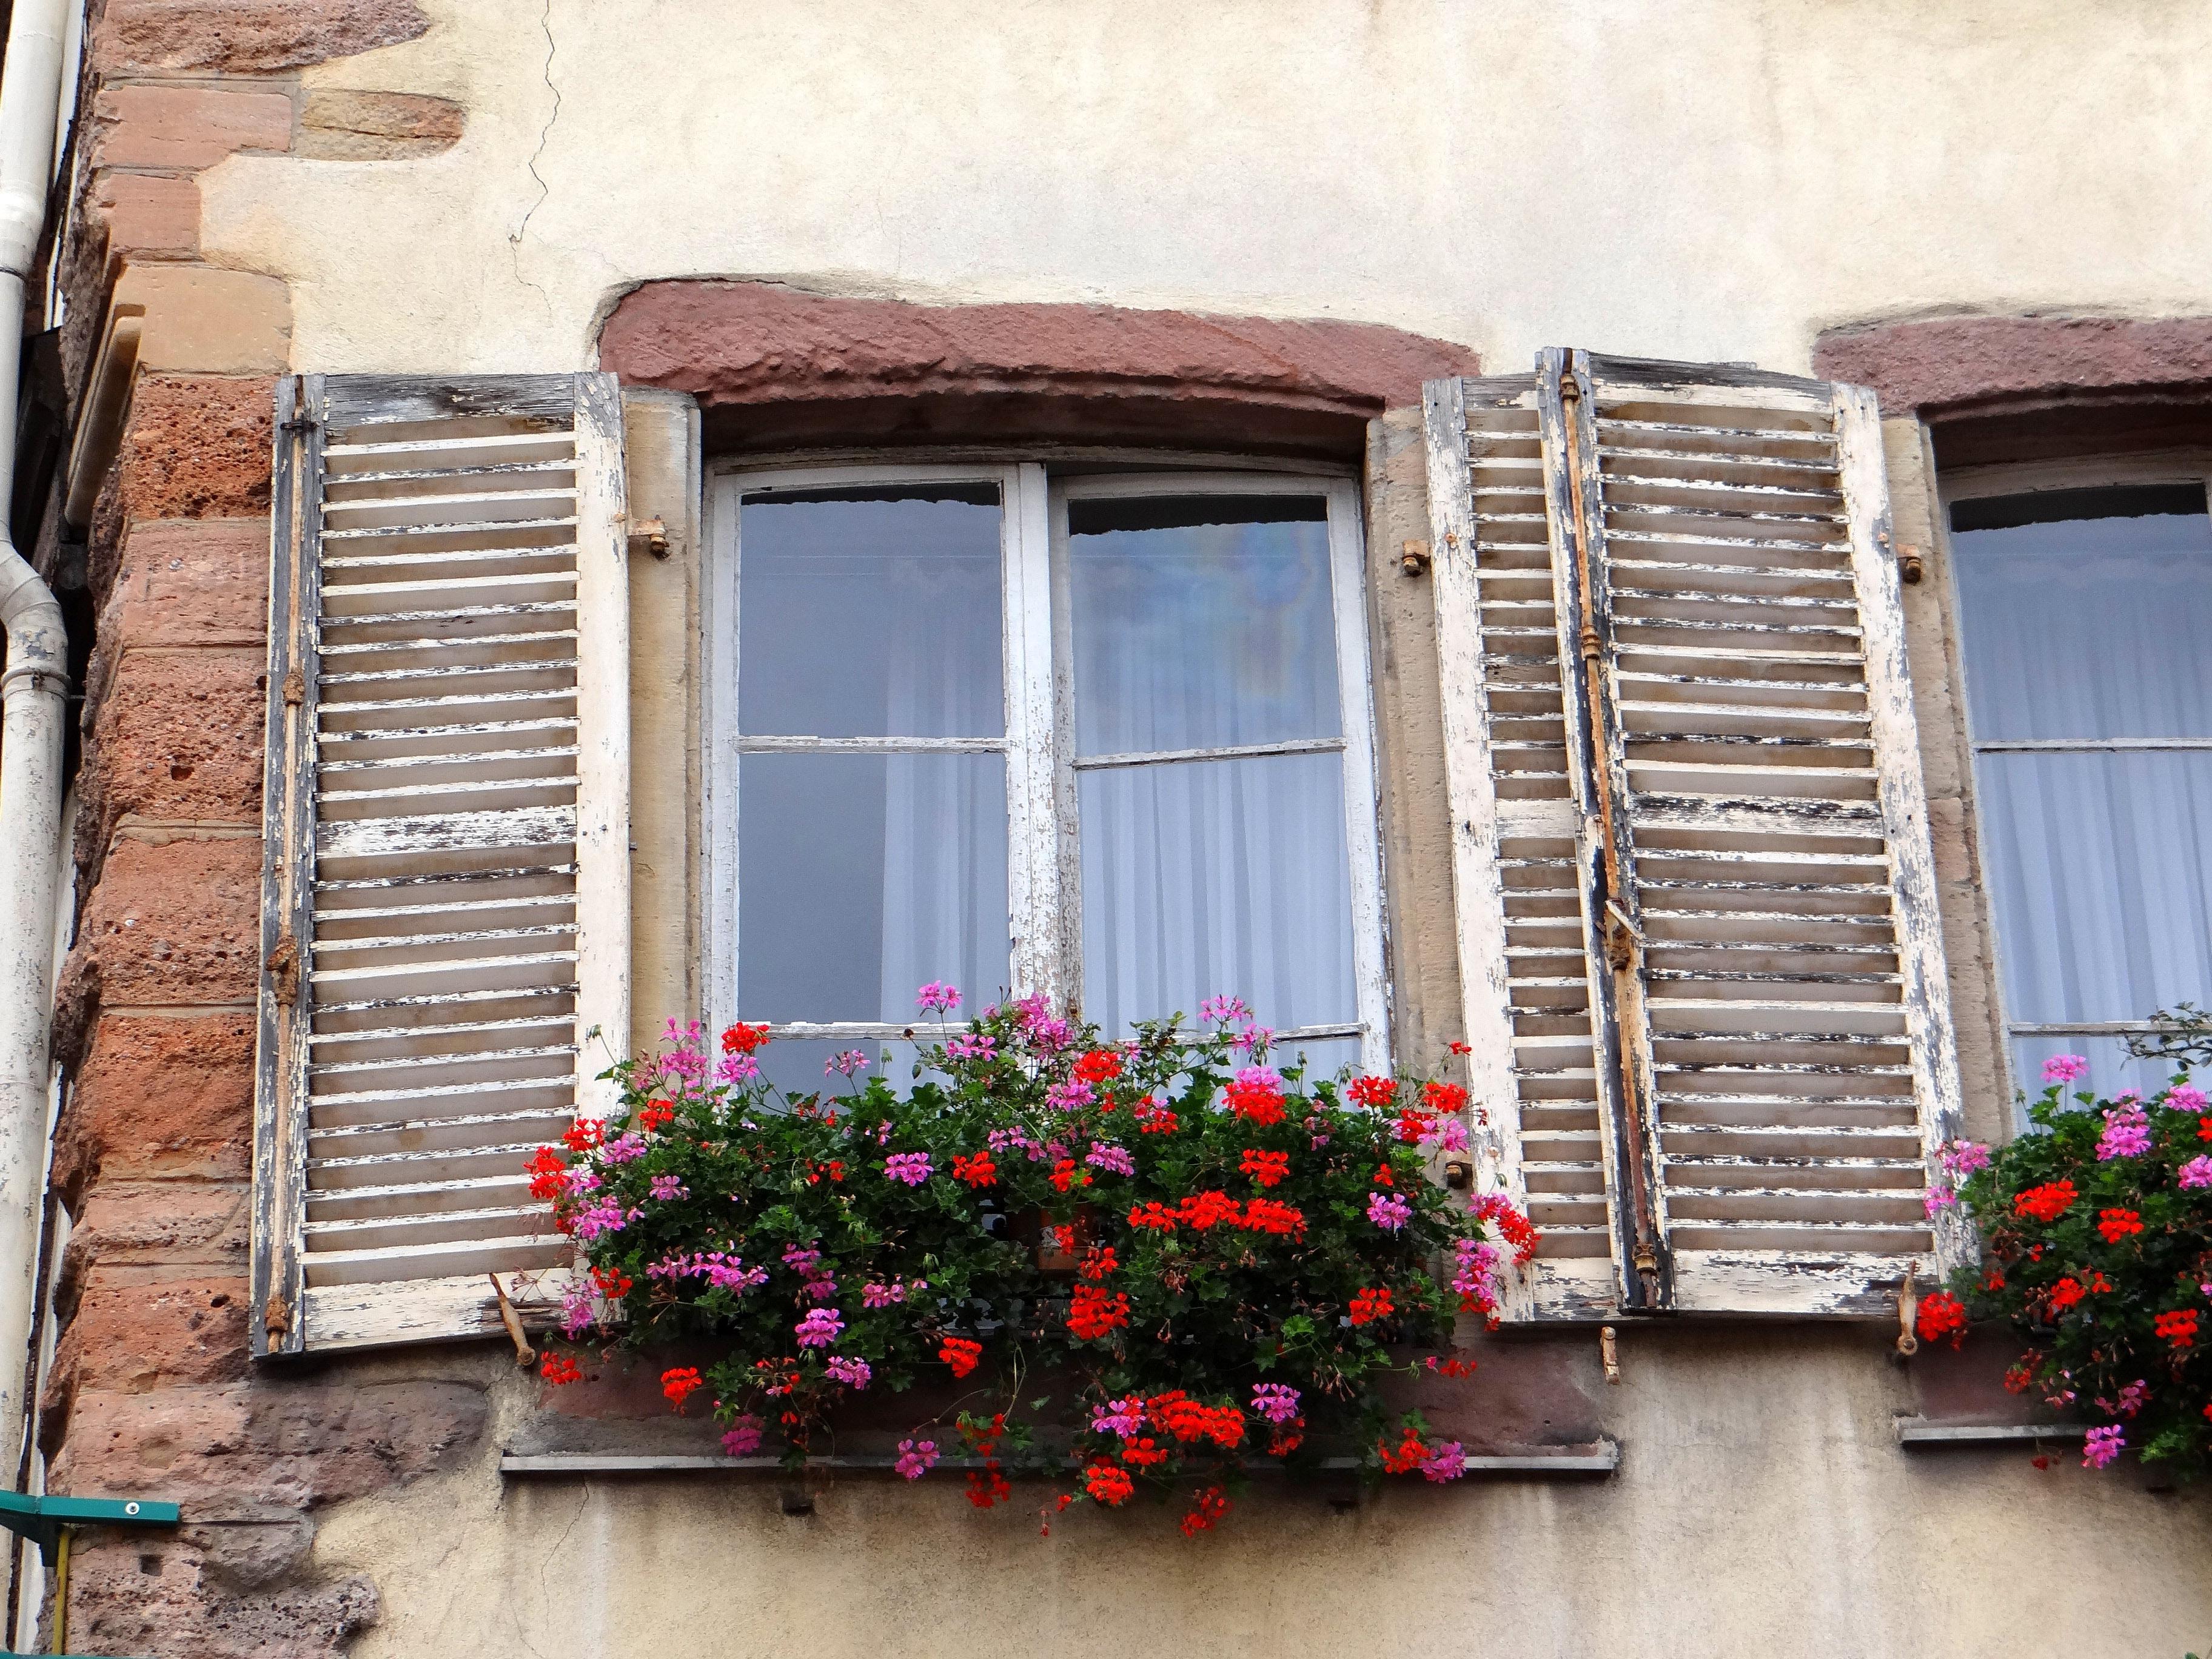 balkon fenster fenster gestalten gardinen fur so gestalten sie fenster gestalten with balkon. Black Bedroom Furniture Sets. Home Design Ideas